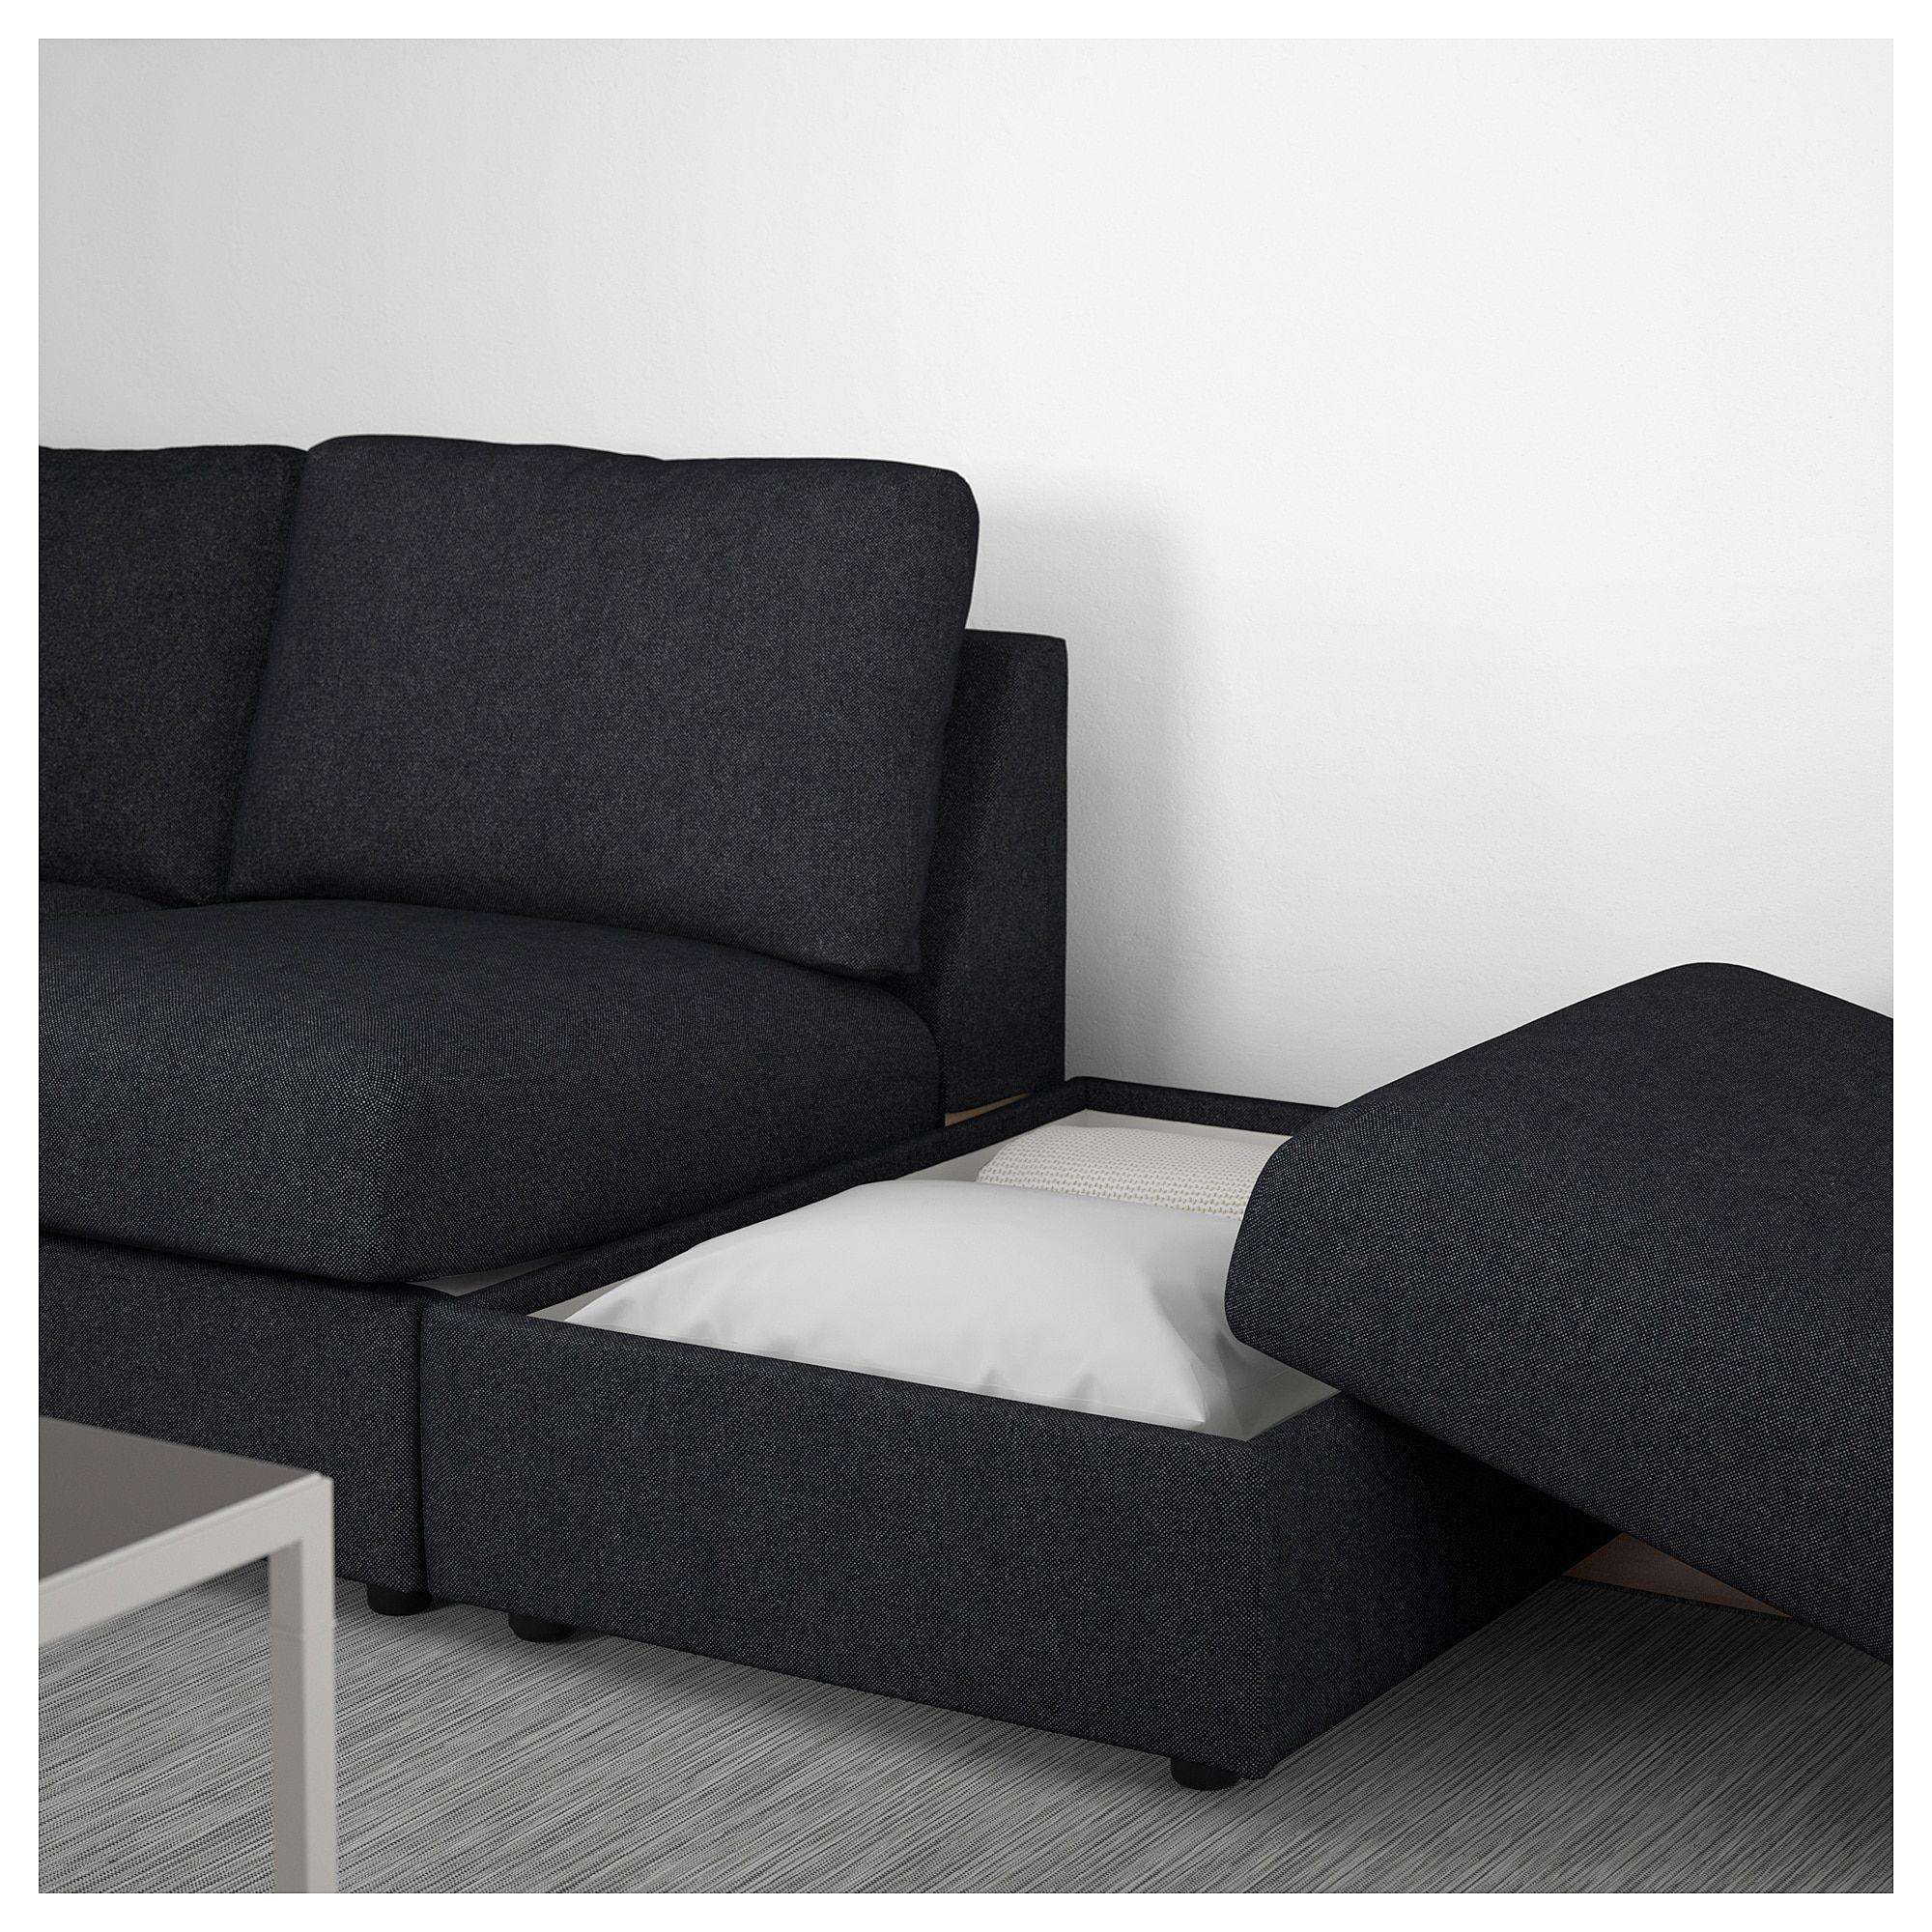 Vimle Ecksofa 3 Sitzig Ohne Abschluss Tallmyra Schwarz Grau 3er Sofa Modulares Ecksofa Und Sofa